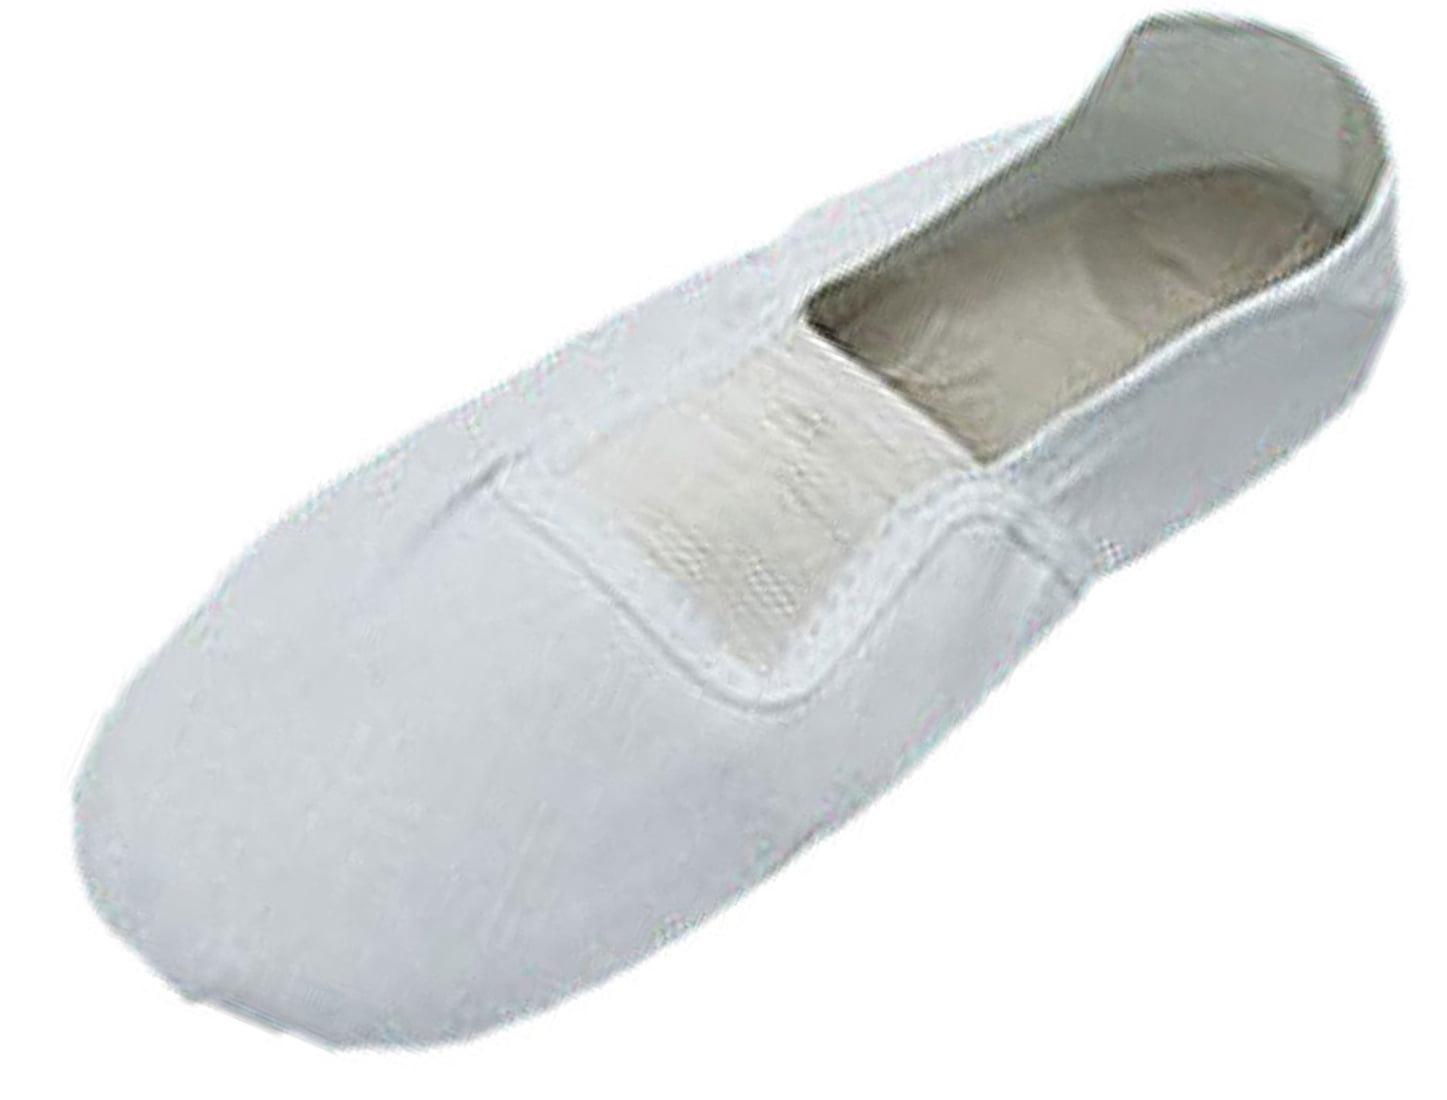 Unique Bargains 11.5 Size Elastic Band White Dancing Dance Girls Shoes New